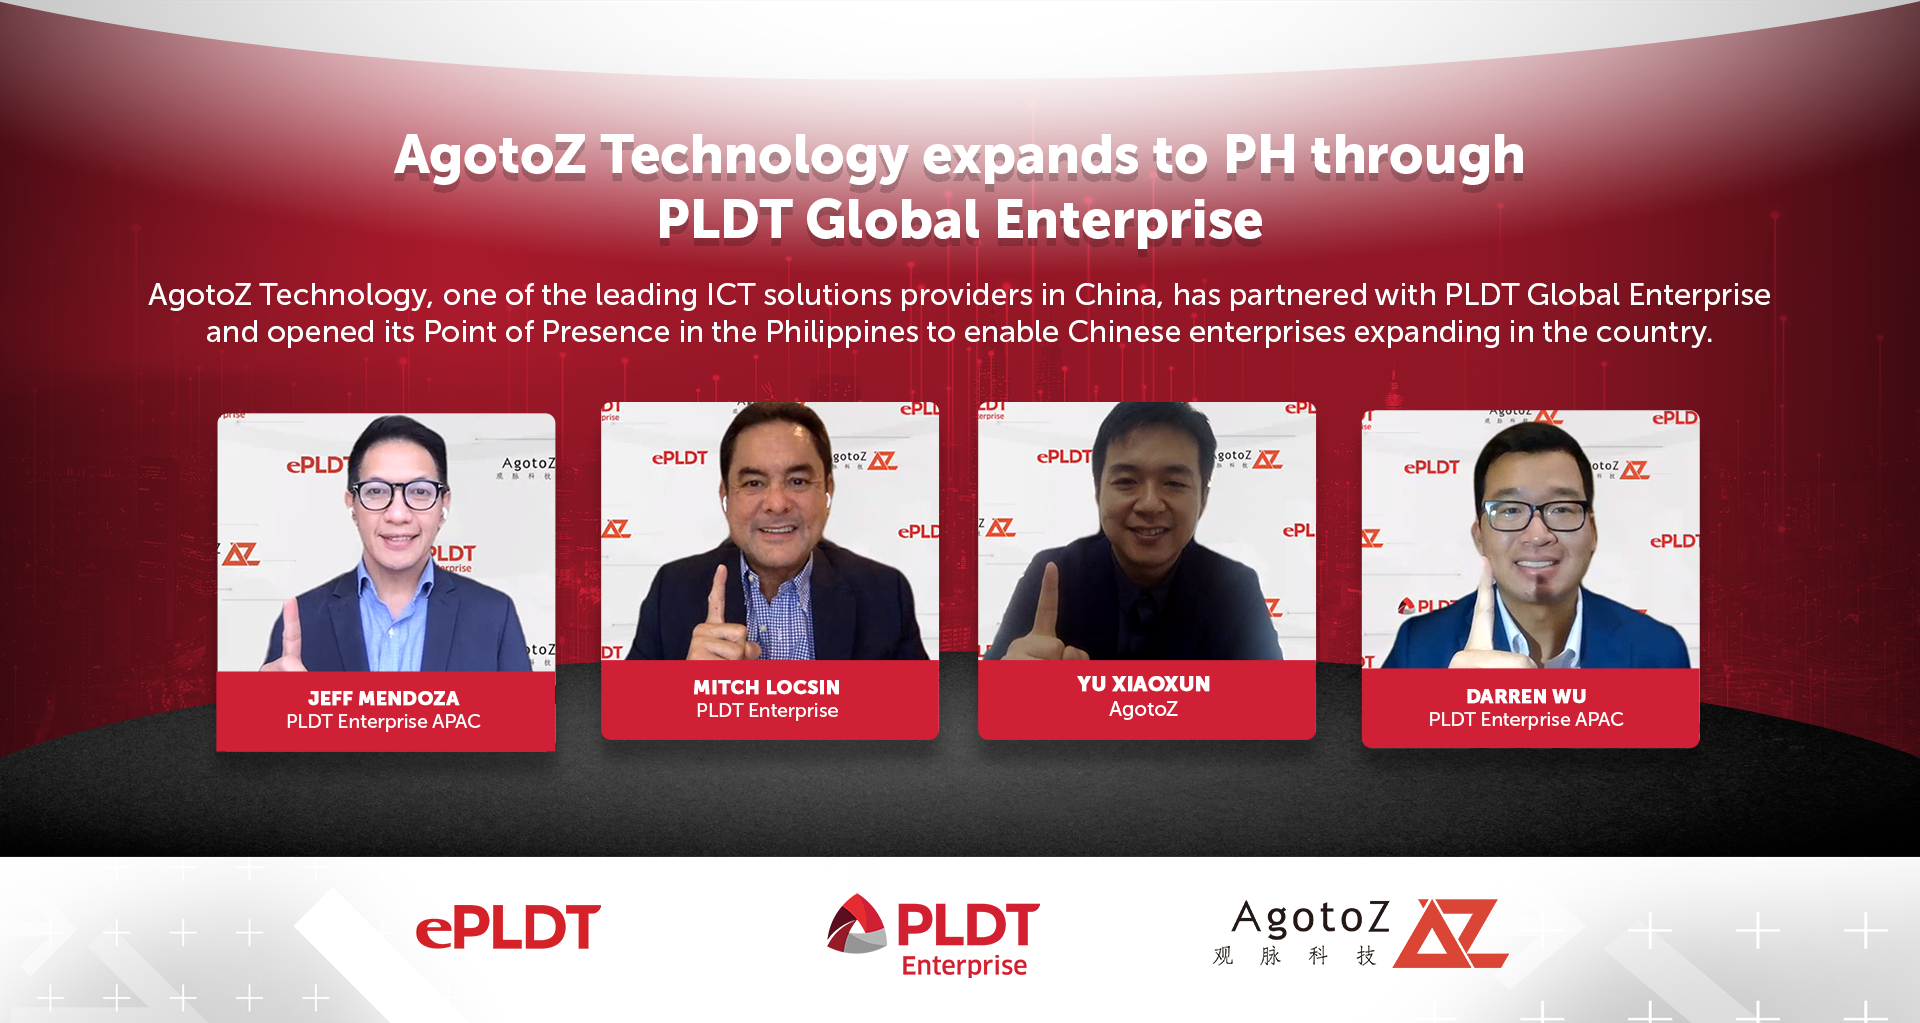 AgotoZ Technology expands to PH through PLDT Global Enterprise